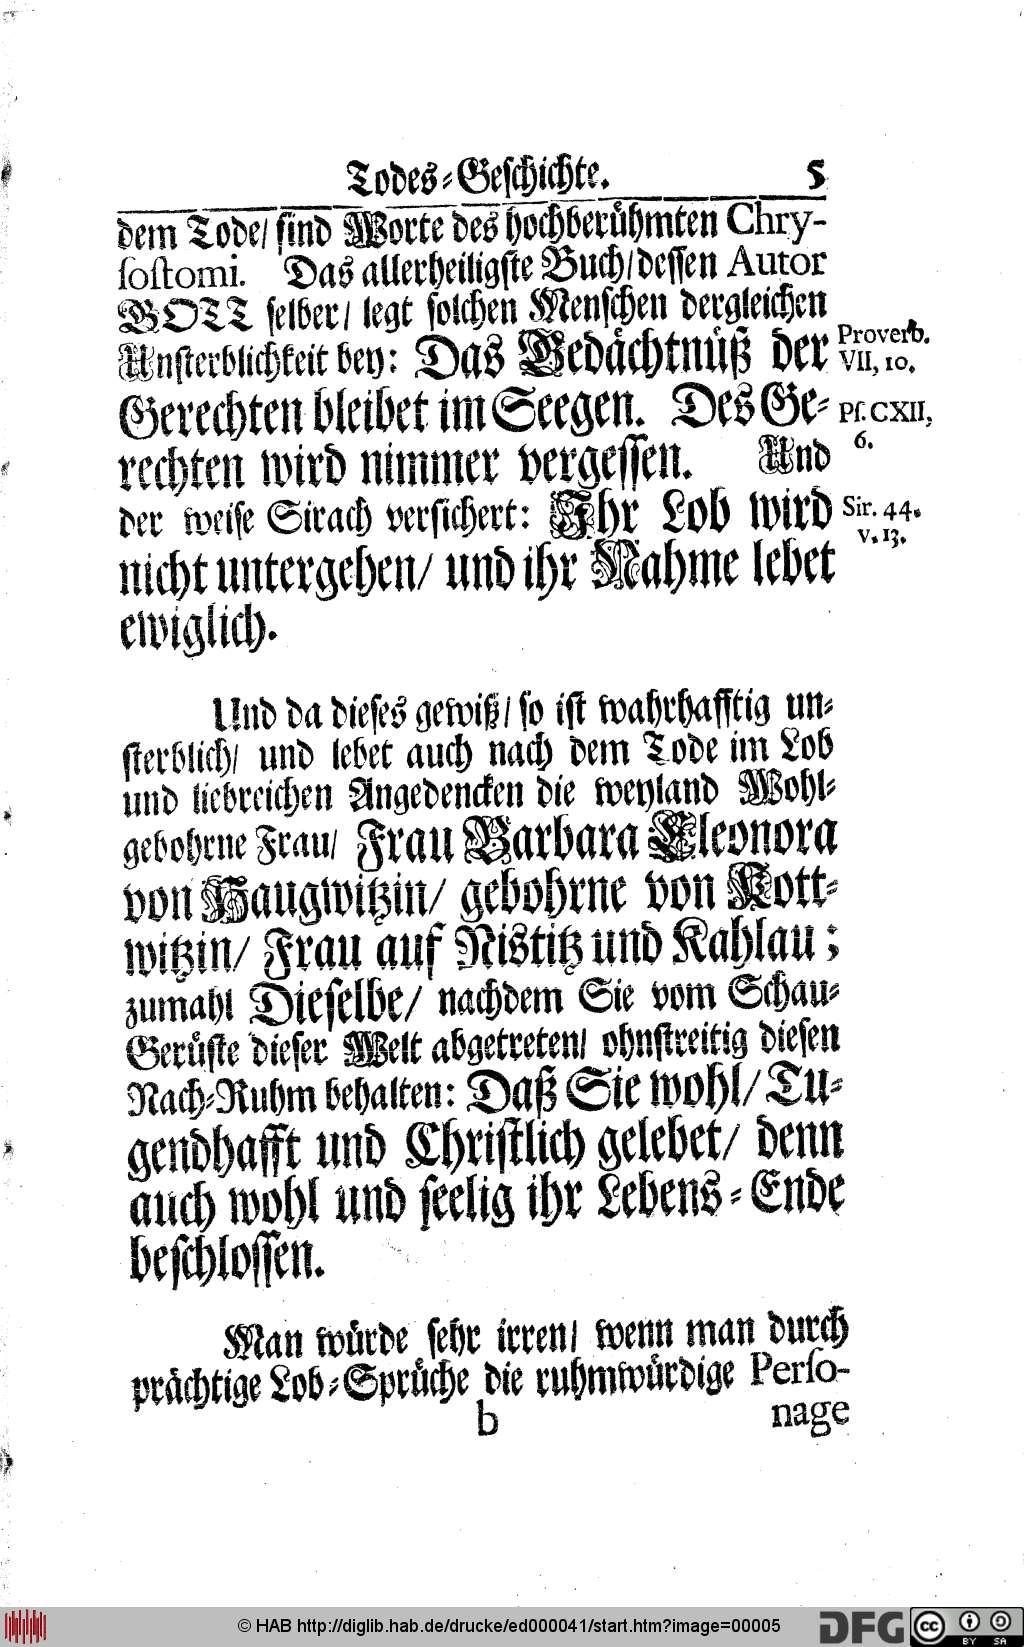 http://diglib.hab.de/drucke/ed000041/00005.jpg